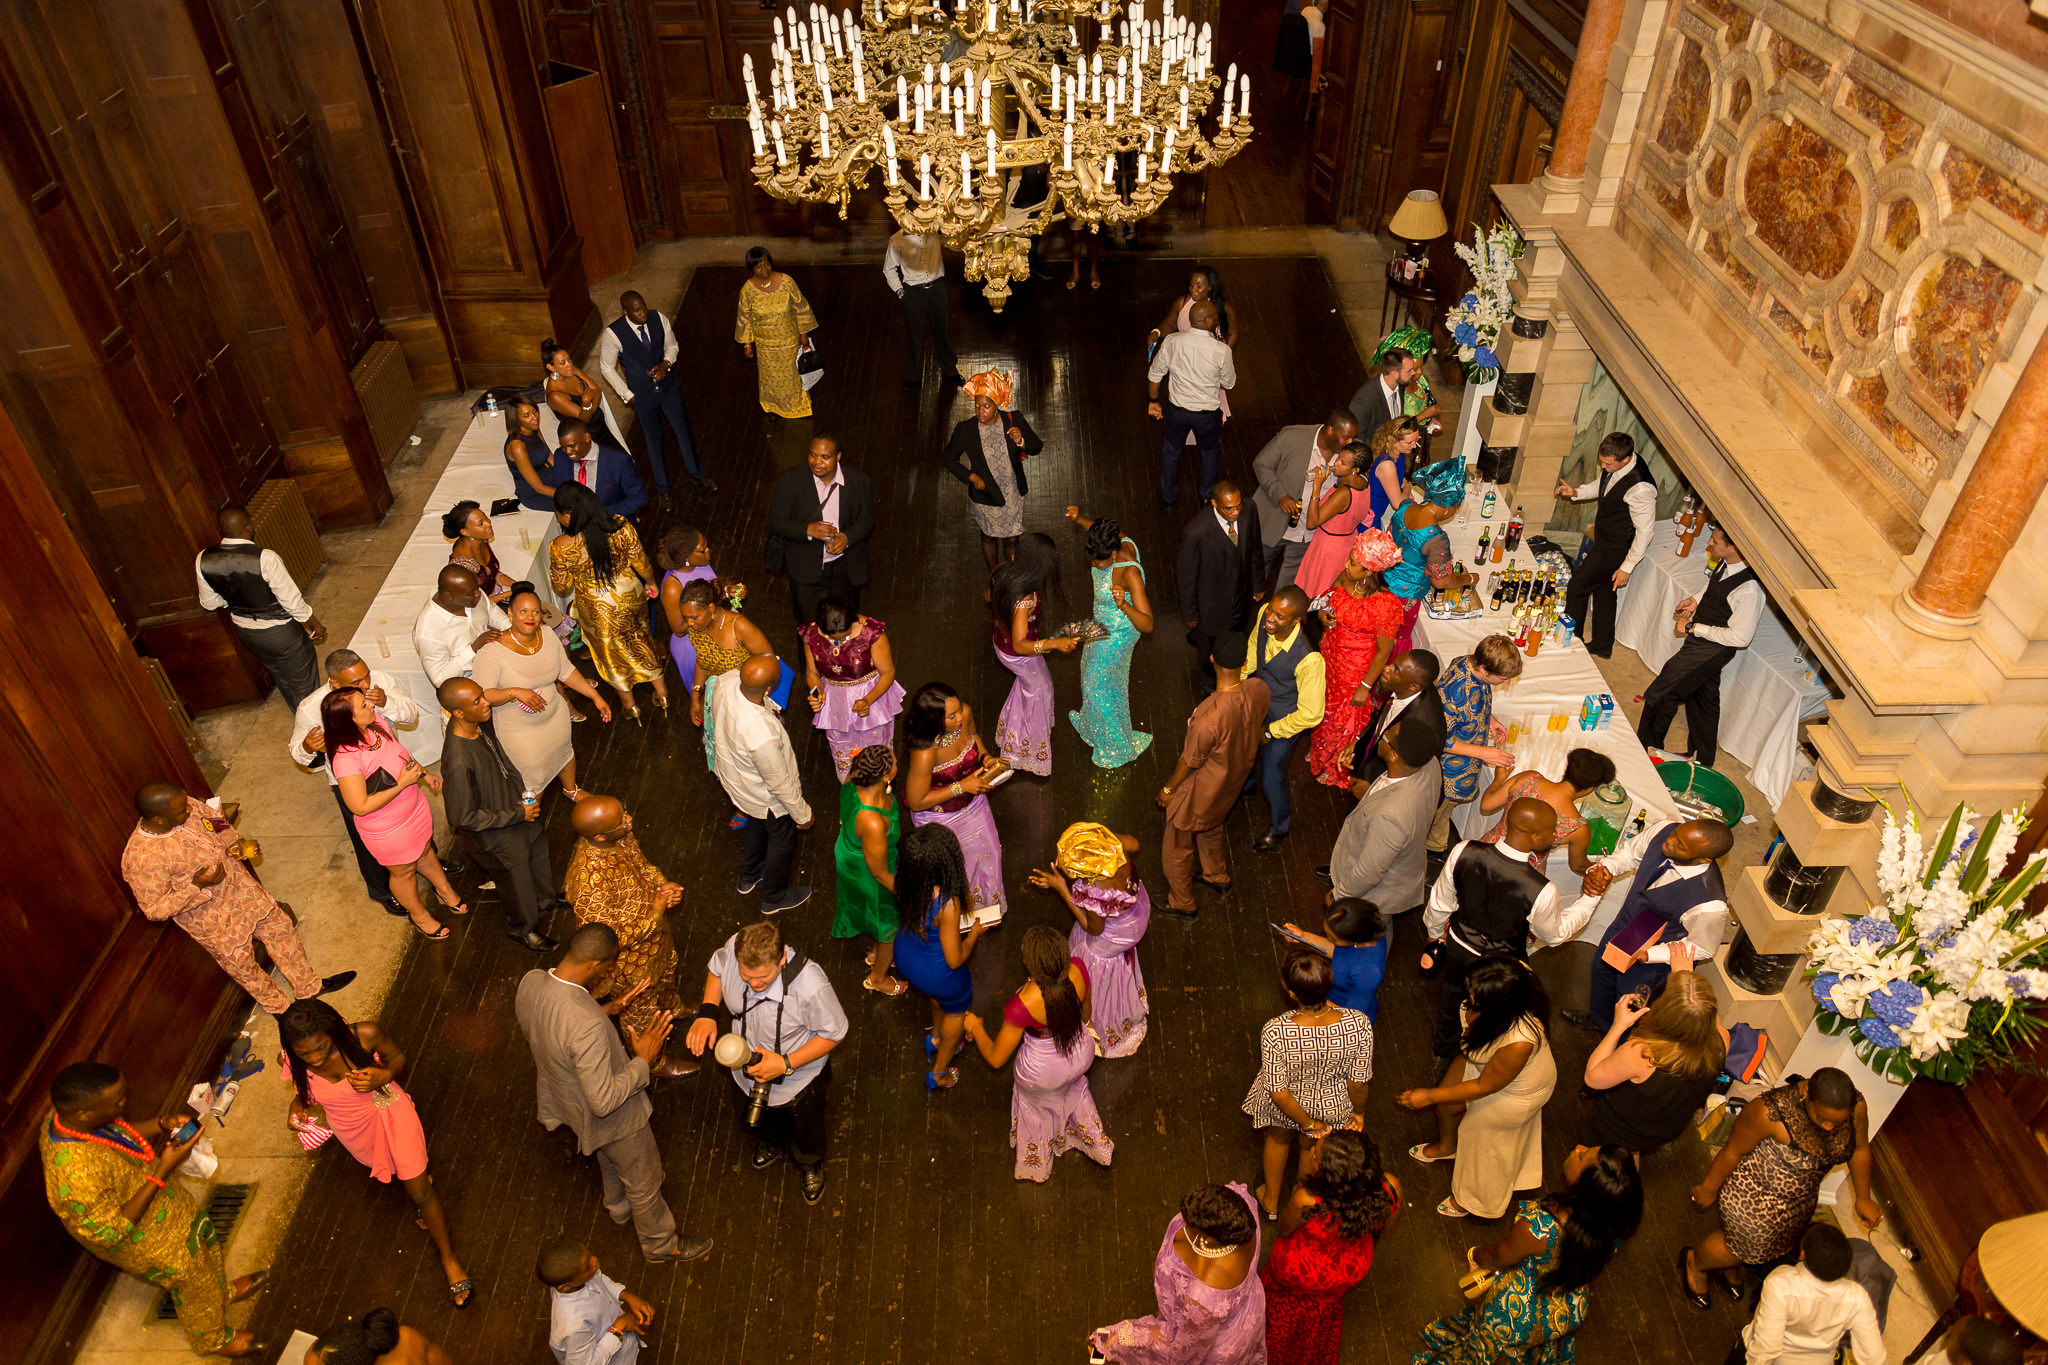 Addington Palace wedding dance florr view from above